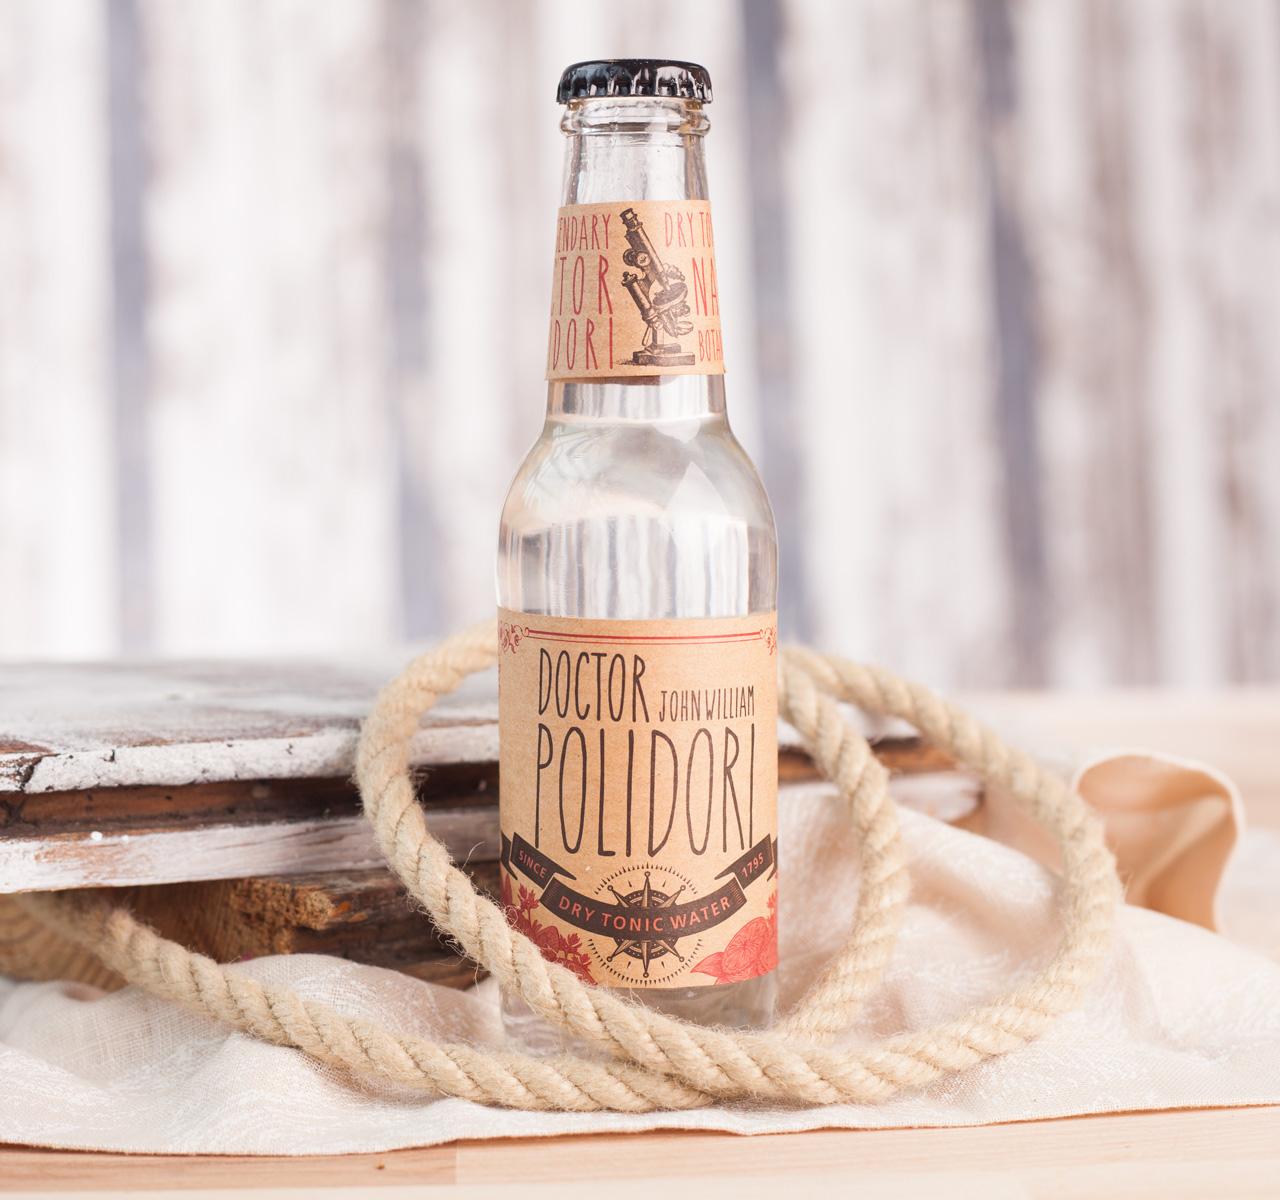 Doctor Polidoris Dry Tonic von Doctor Polidori kaufen | Foodist